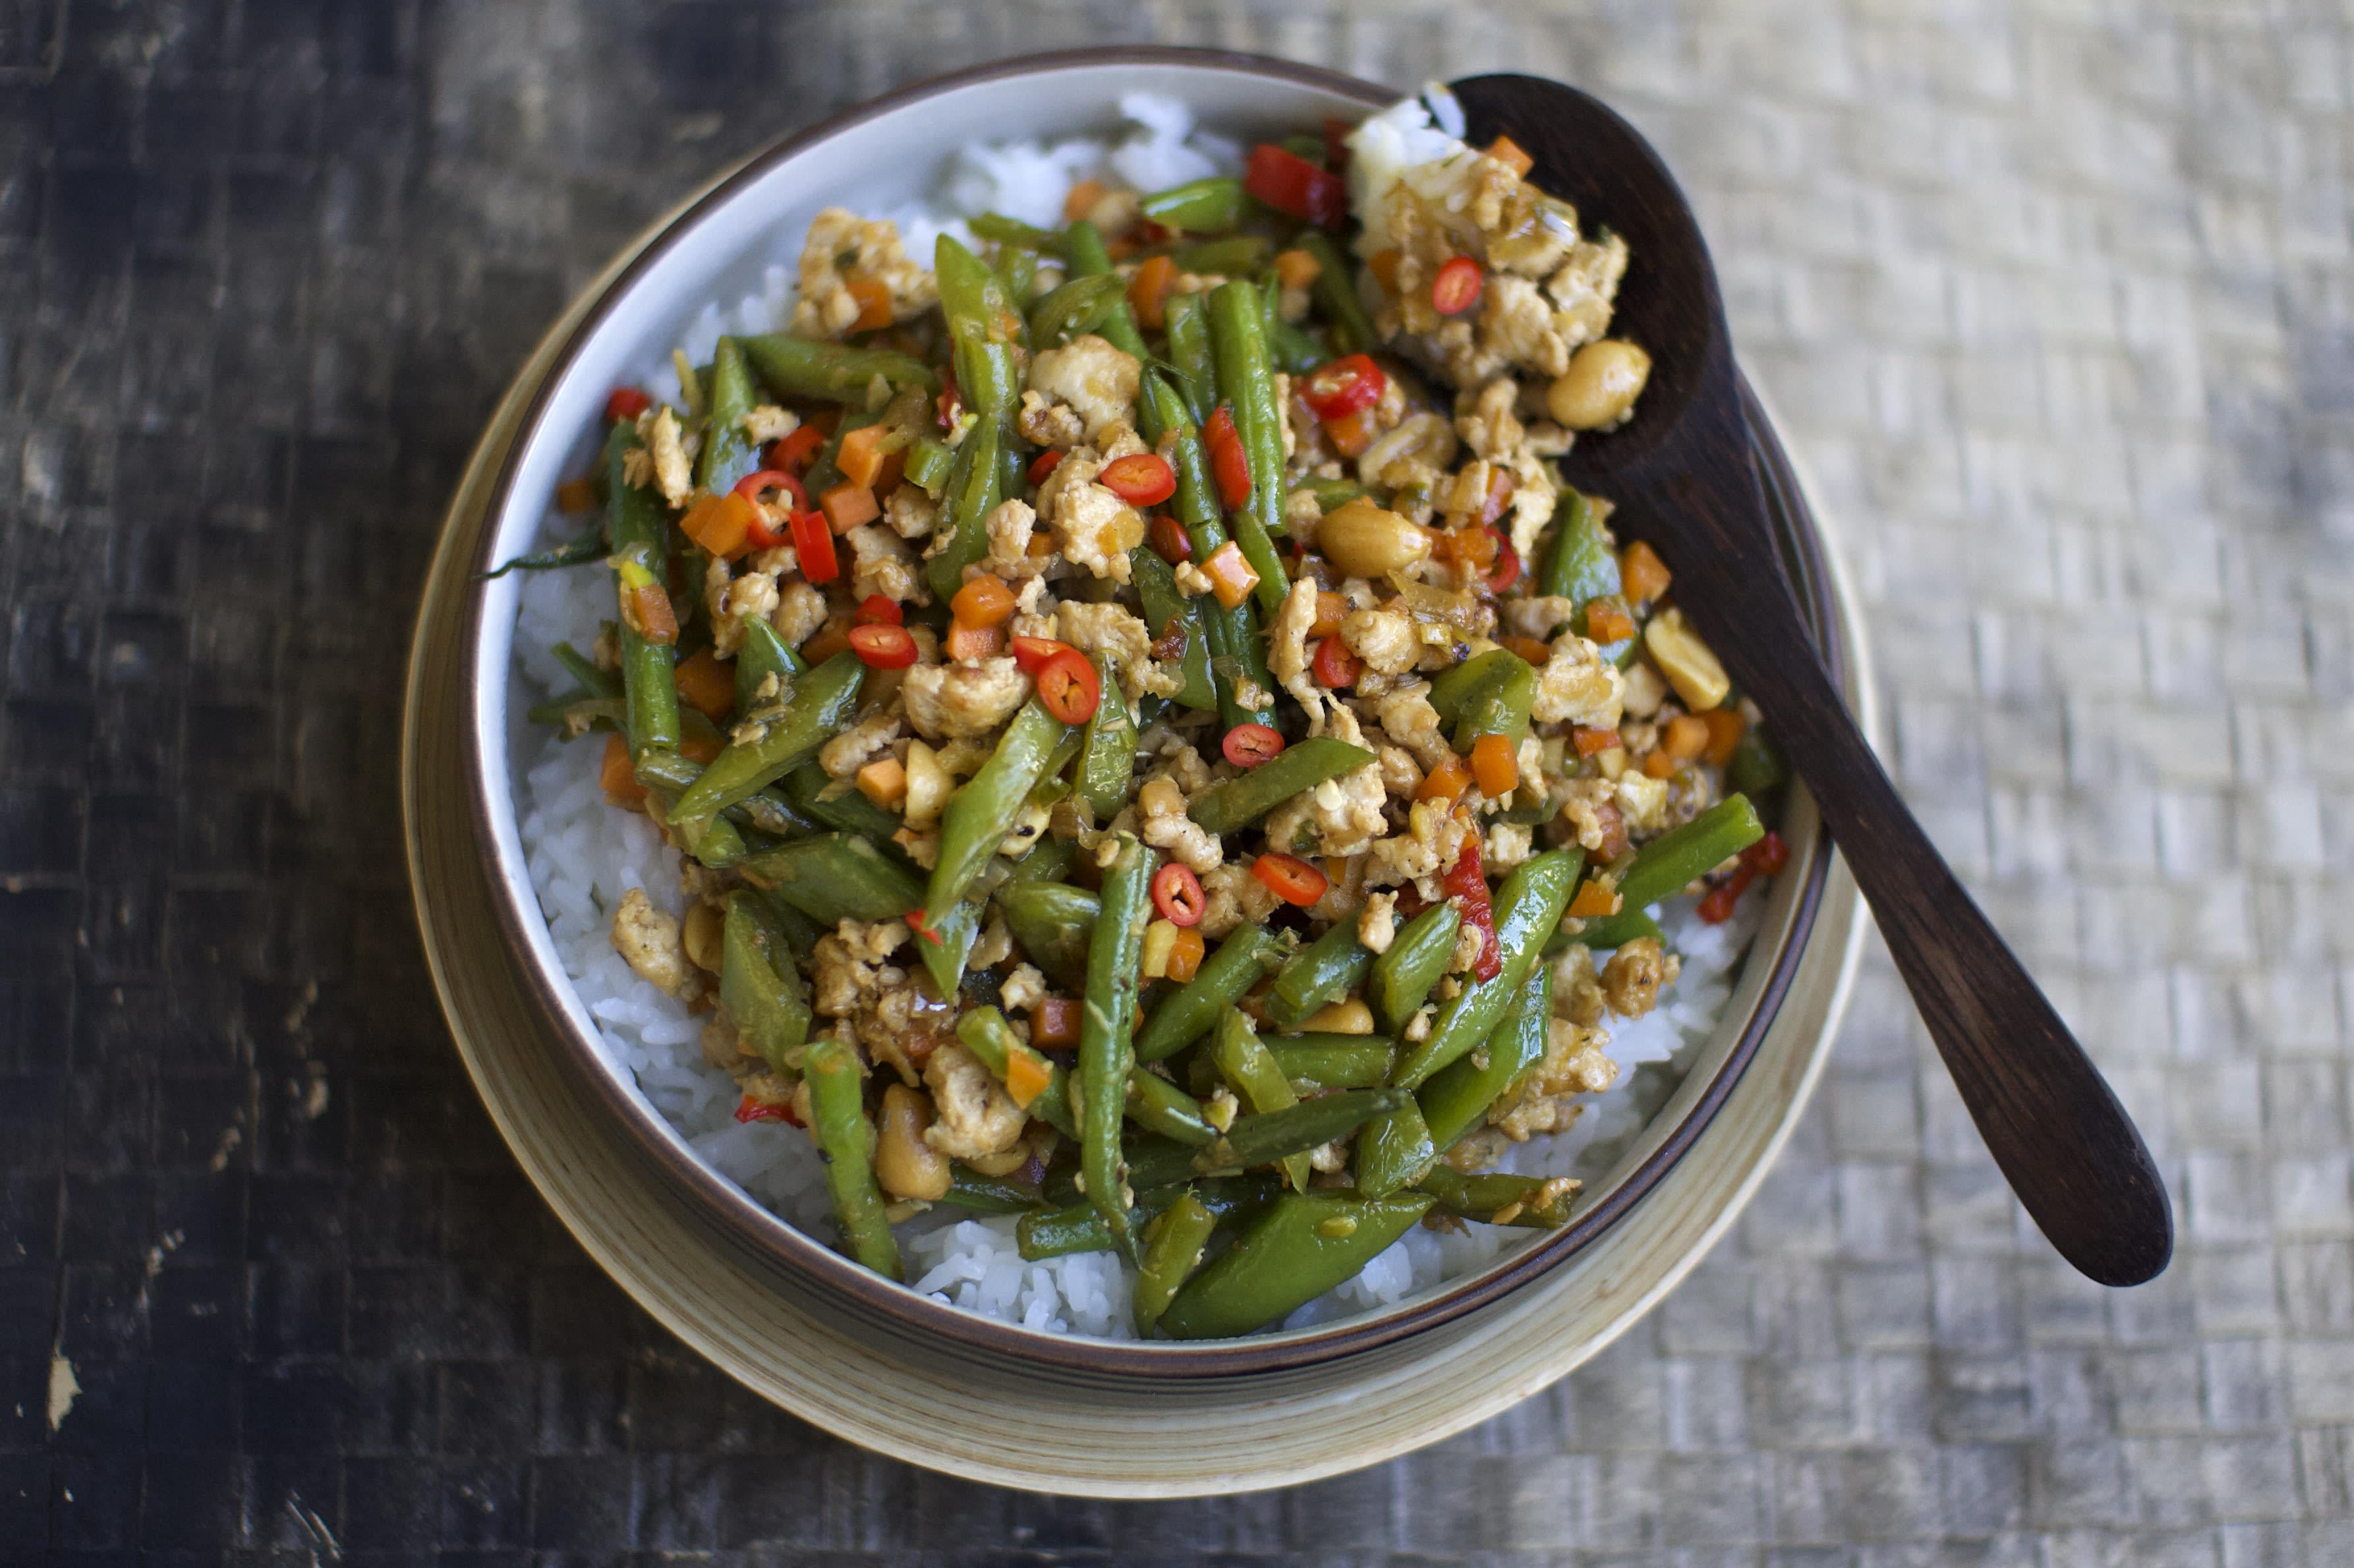 Asian Chicken and Peanut Stir-Fry